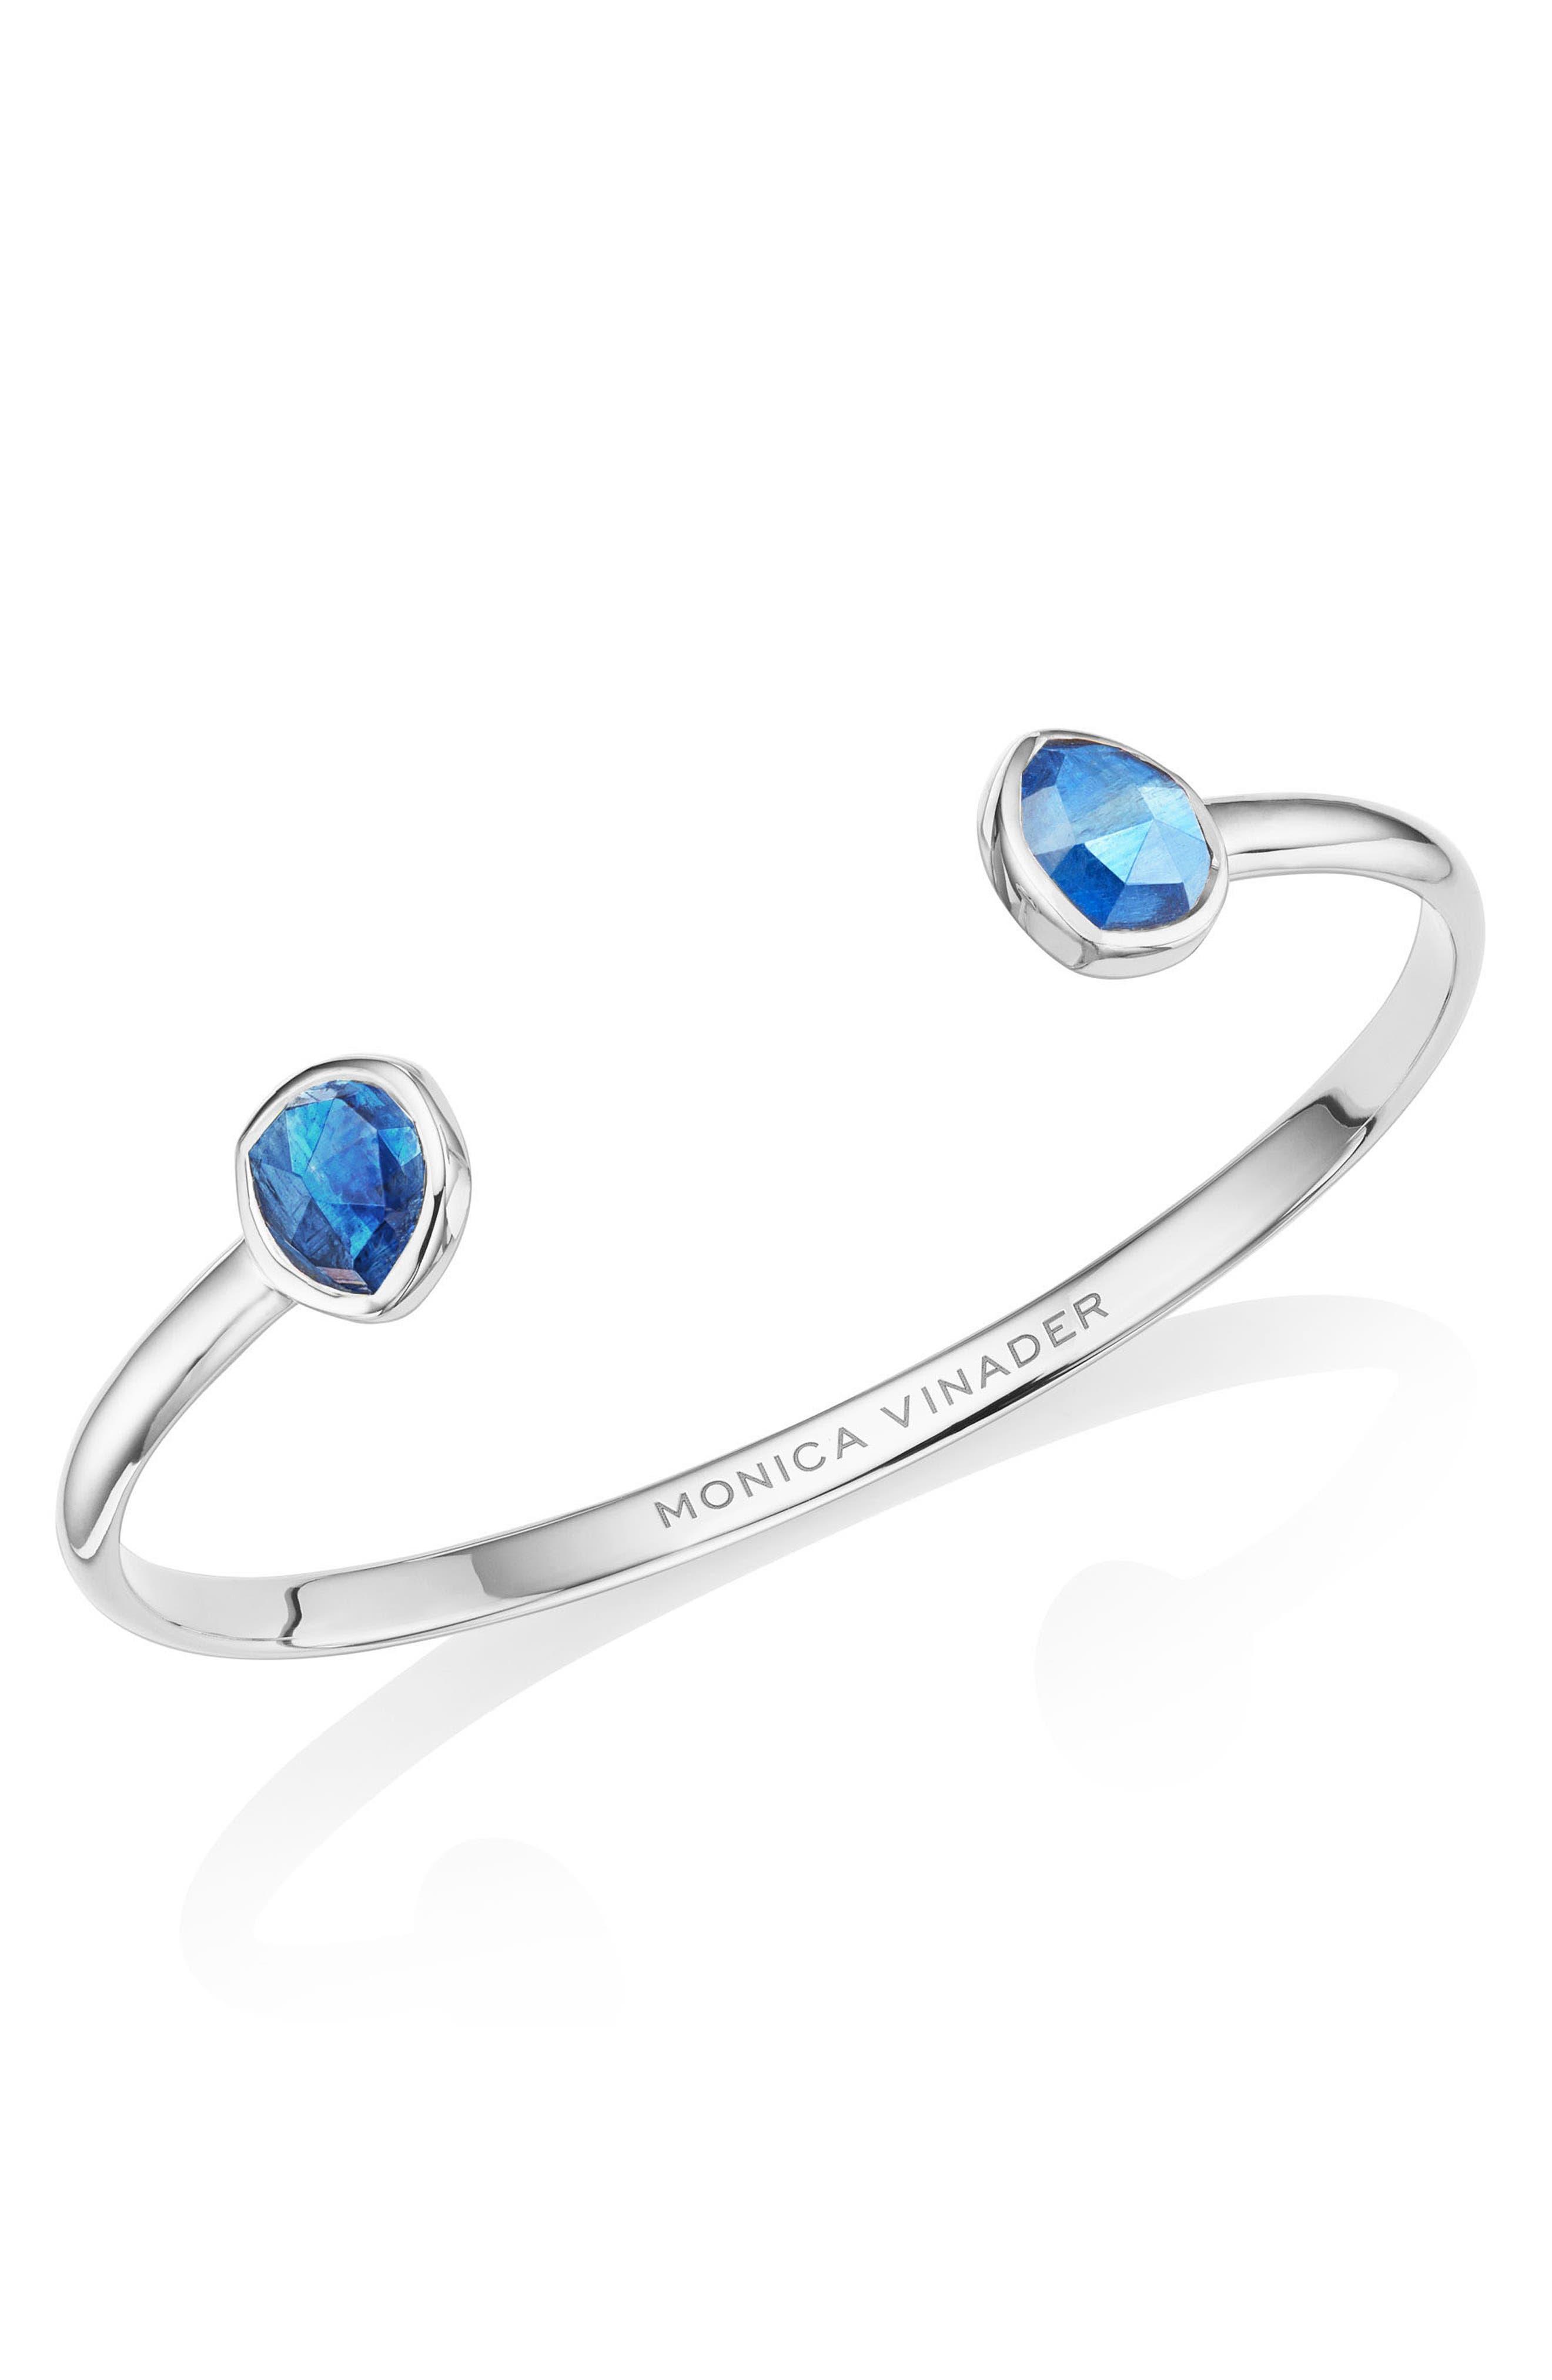 MONICA VINADER Siren Thin Cuff Bracelet, Main, color, SILVER/ KYANITE